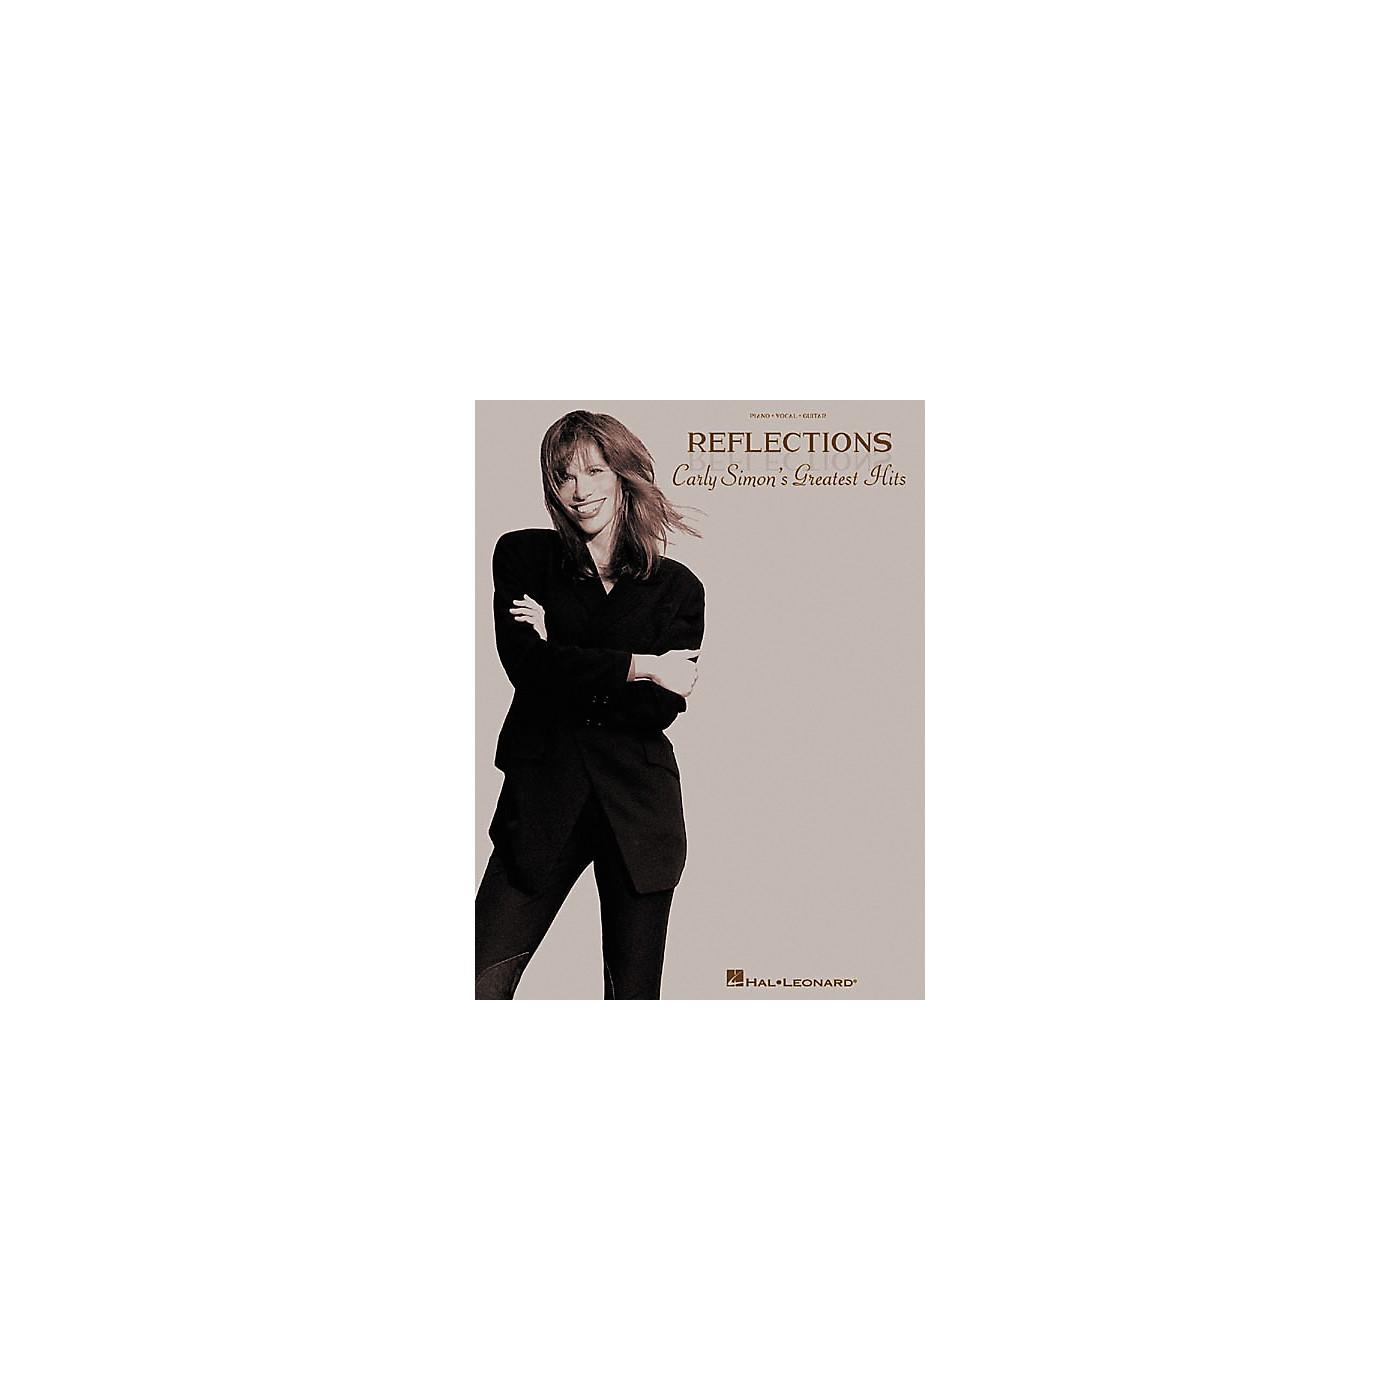 Hal Leonard Reflections - Carly Simon's Greatest Hits Songbook thumbnail